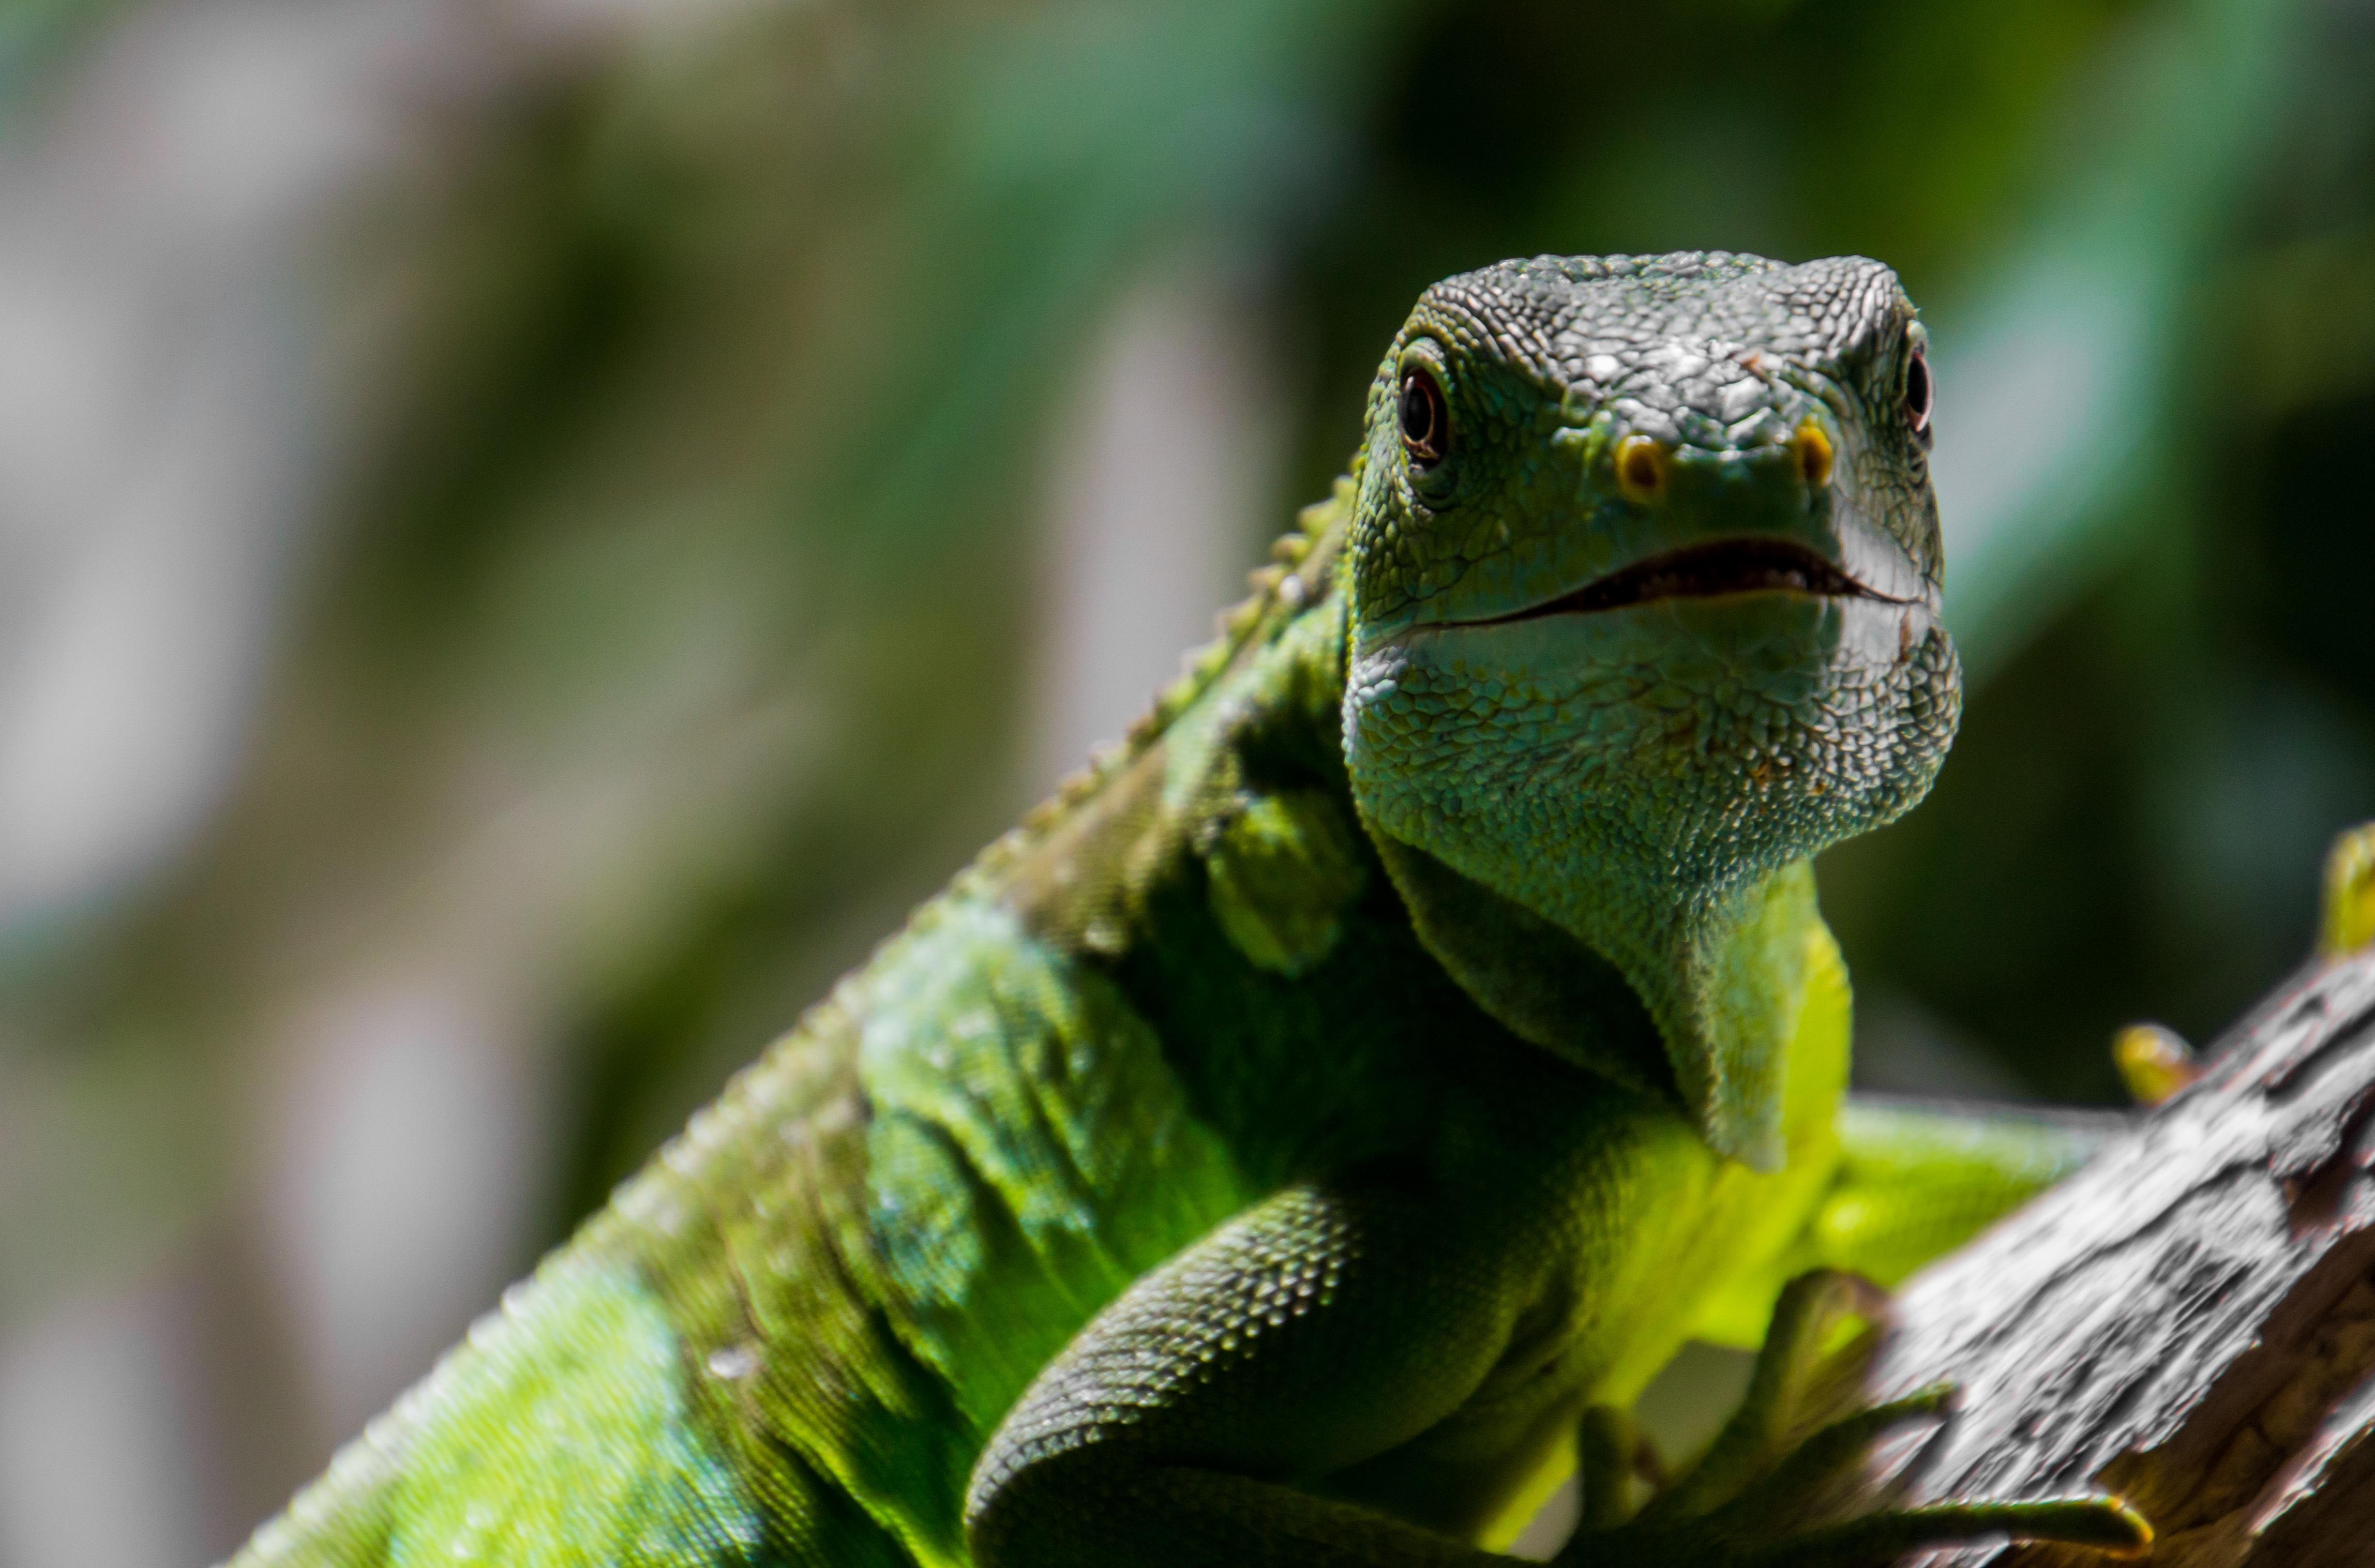 Iguana 4k Ultra HD Wallpaper | Background Image ...